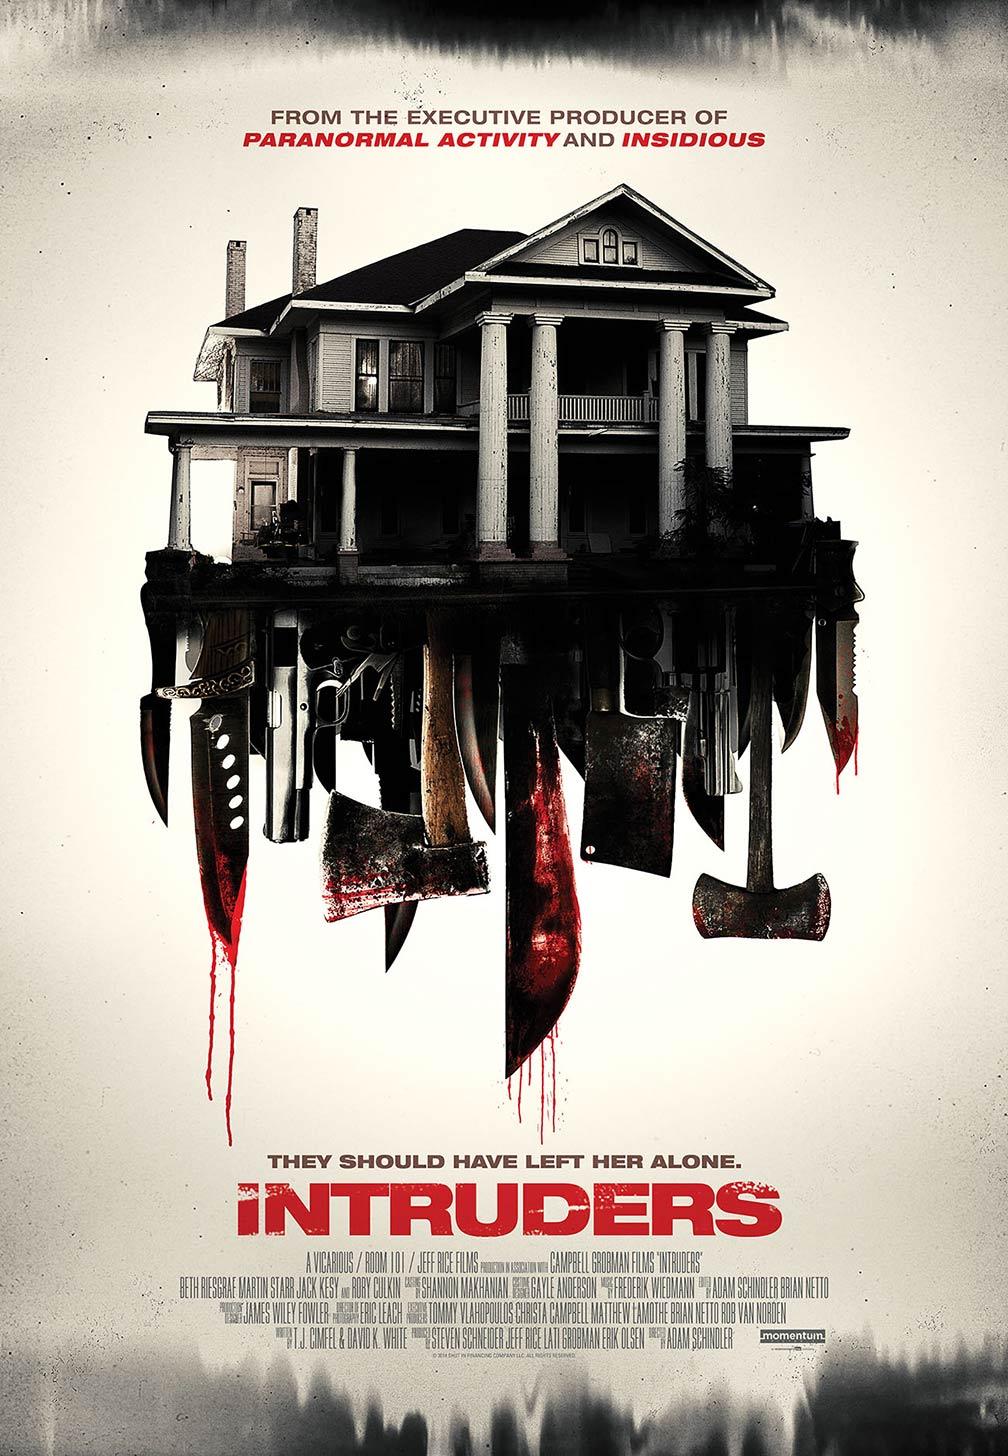 intruders-poster